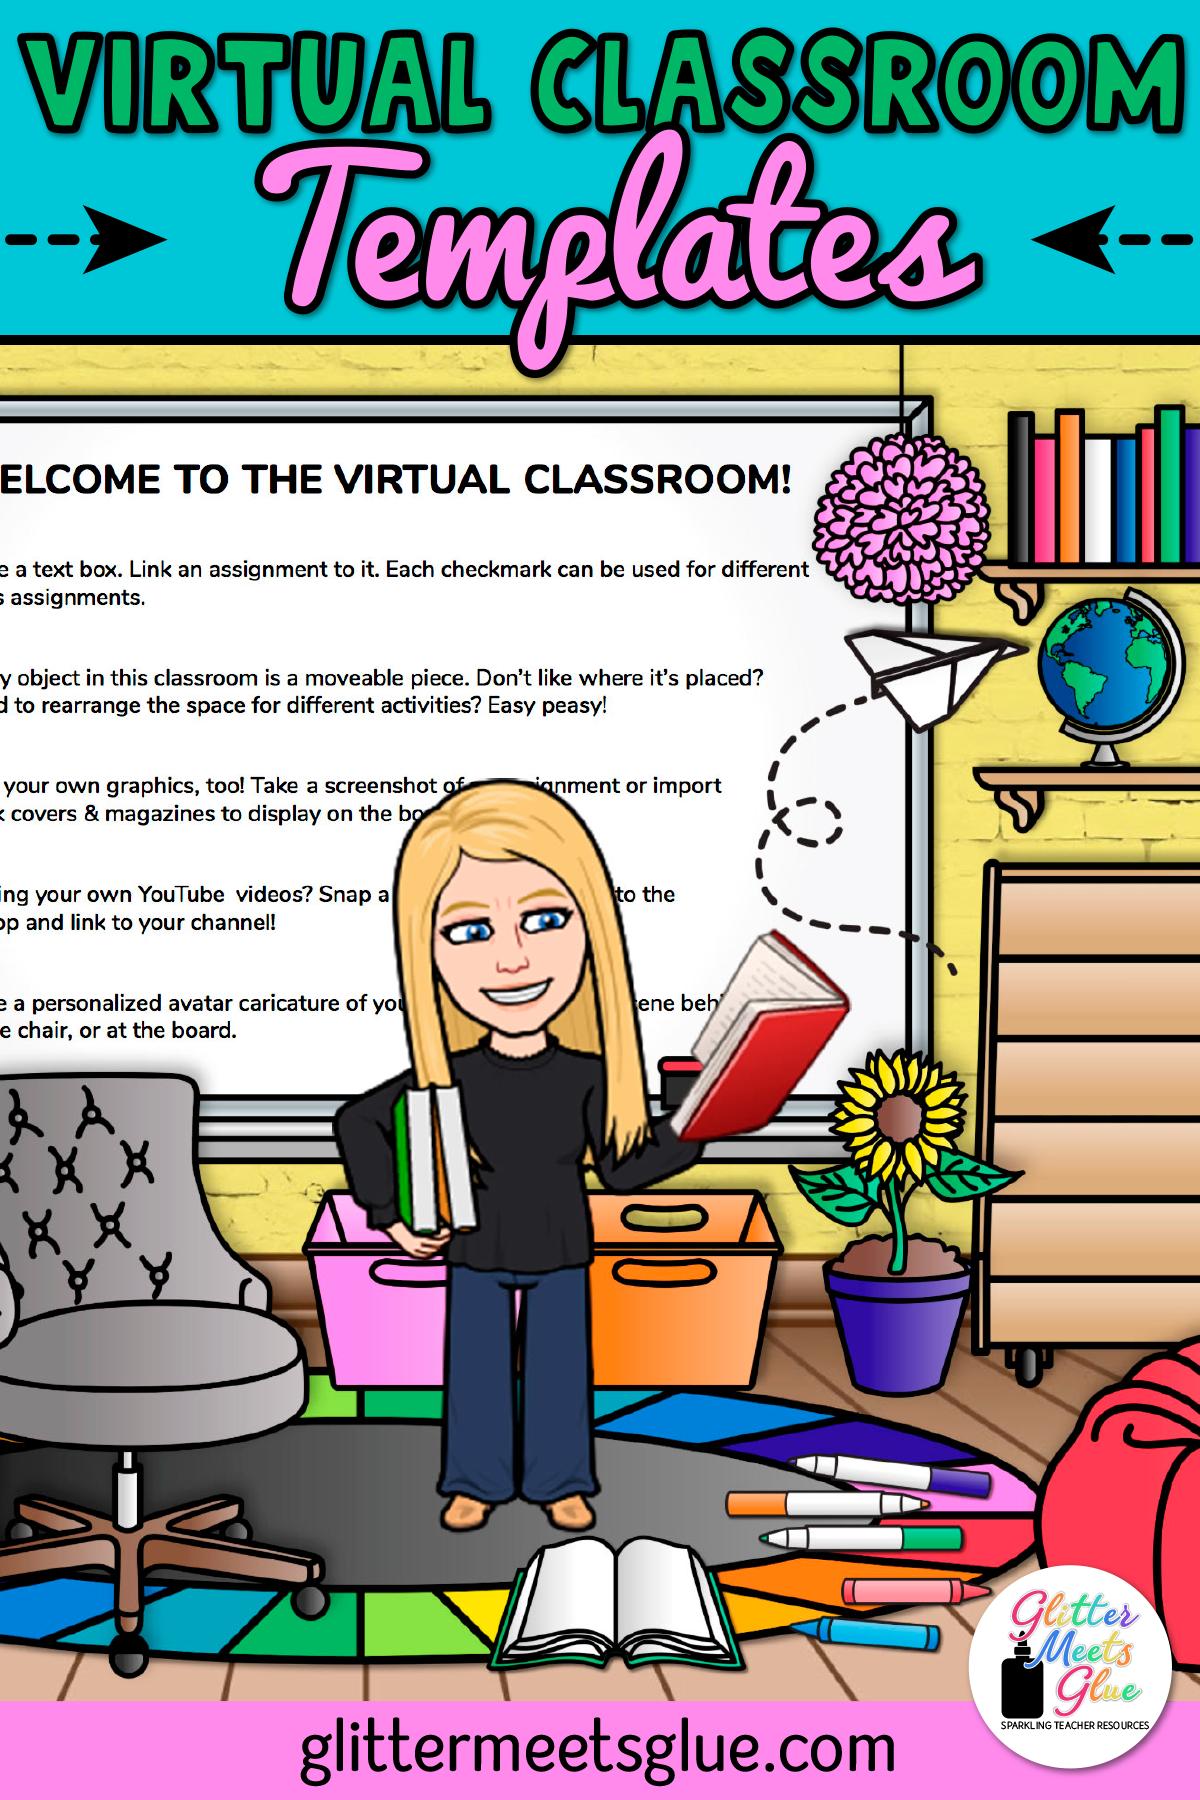 Virtual Classroom Templates For Elementary Teachers Virtual Classrooms Google Classroom Elementary Digital Learning Classroom